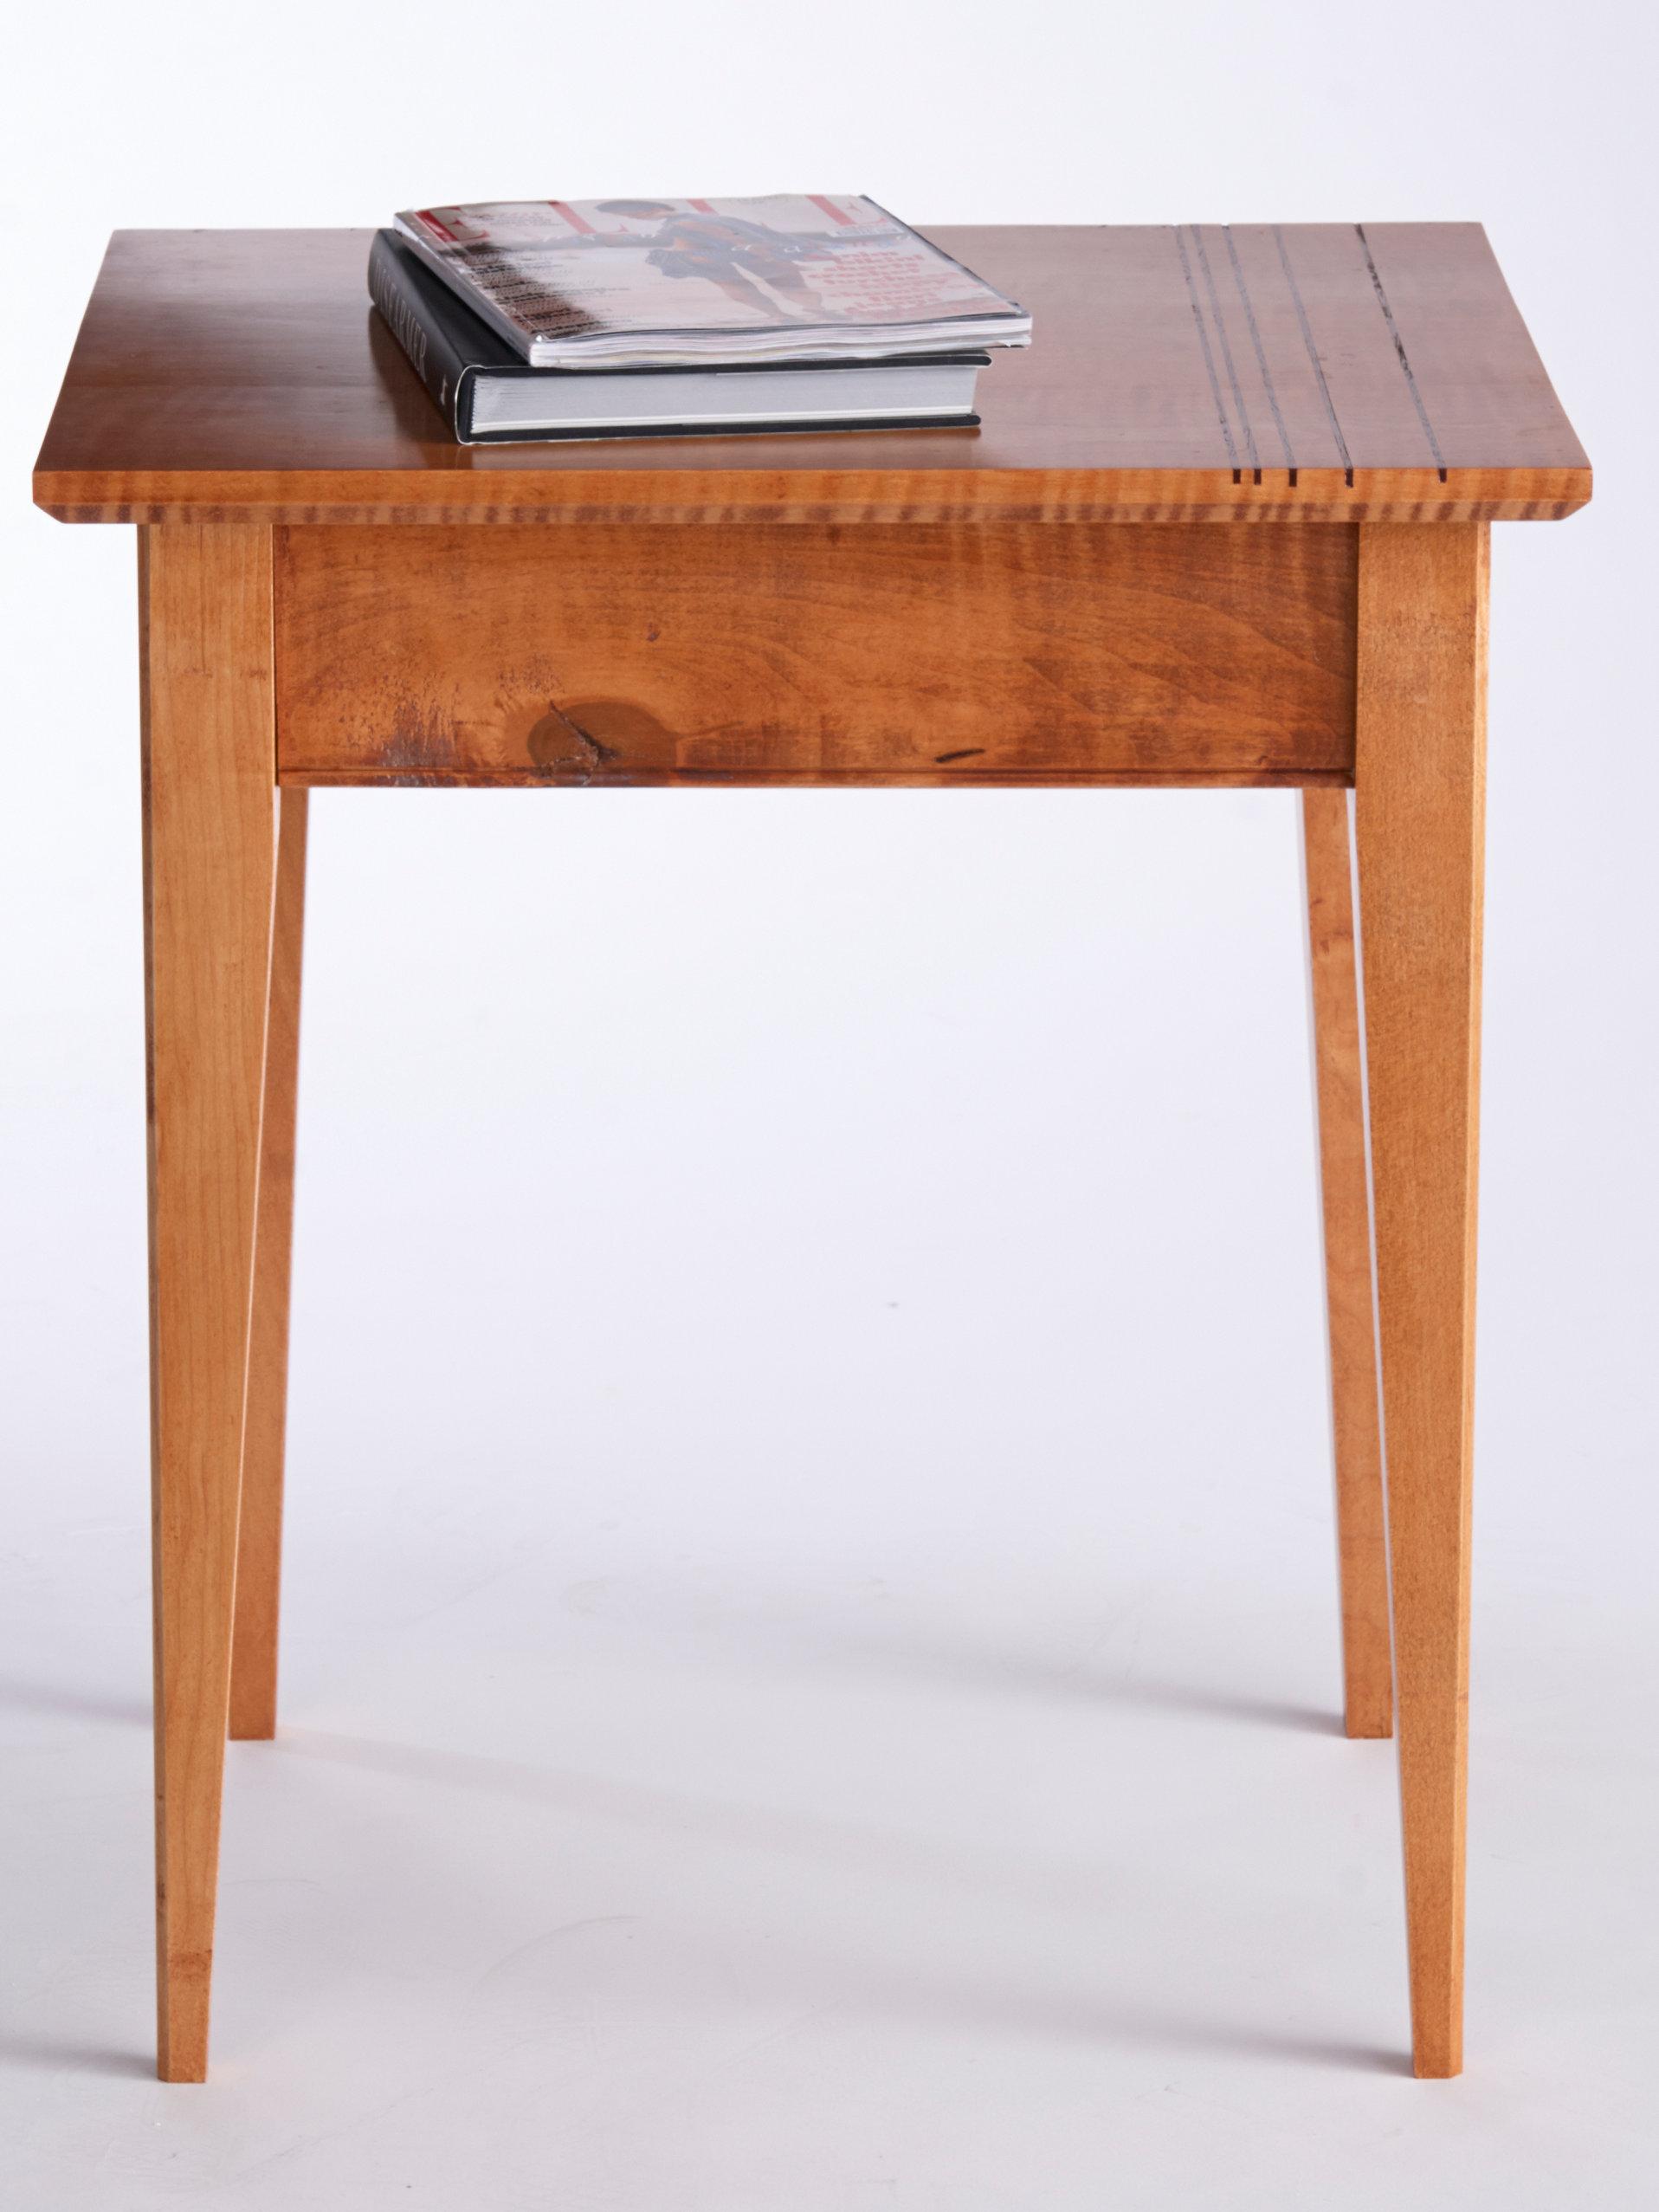 Maineland Furniture Hand made in Maine